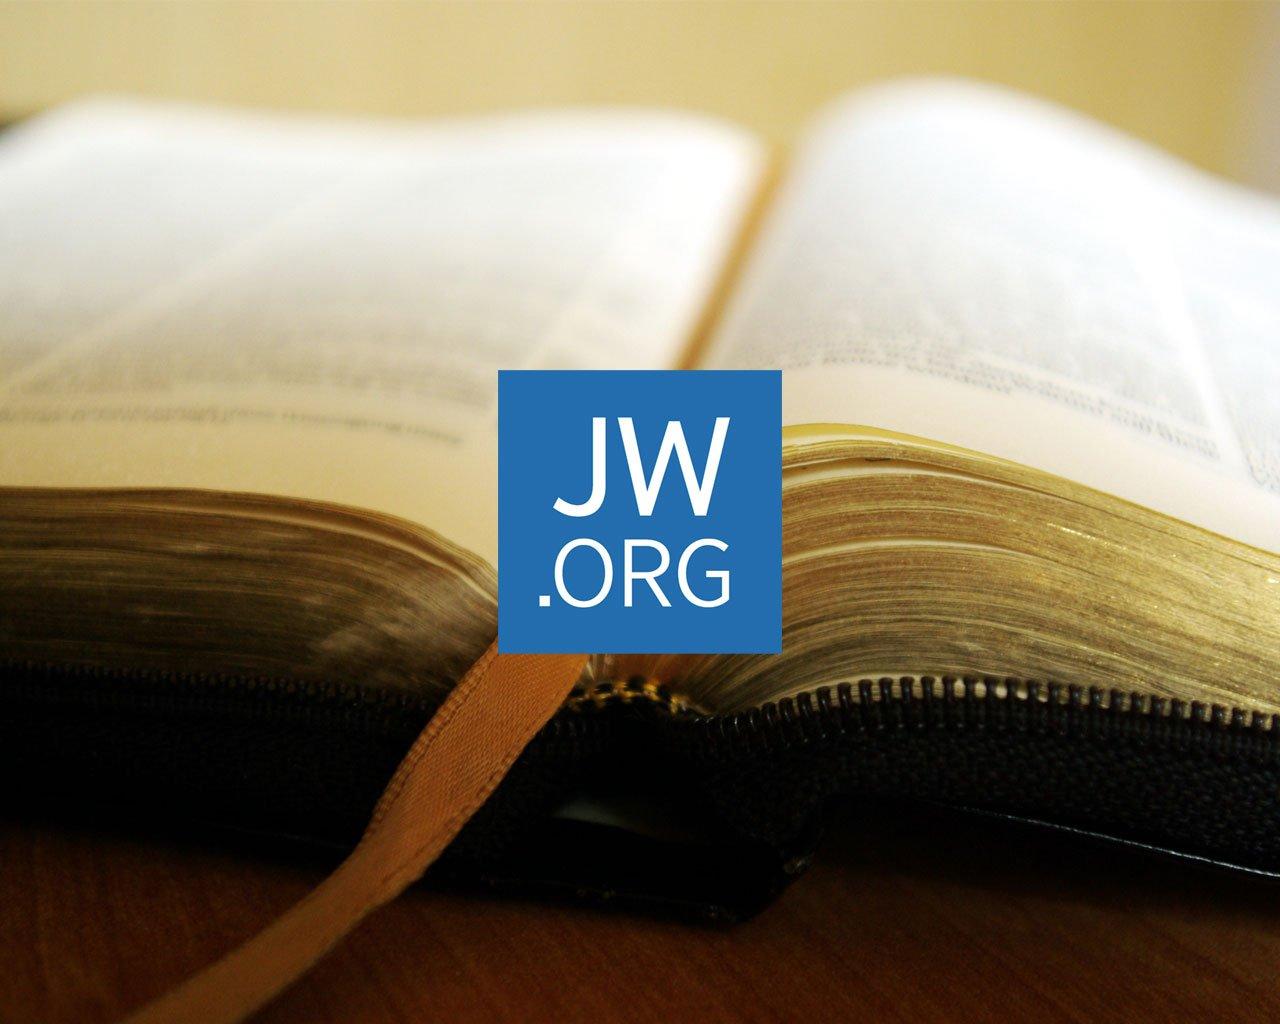 JW News Archive Wallpaper for the Kingdom Hall PC 1280x1024